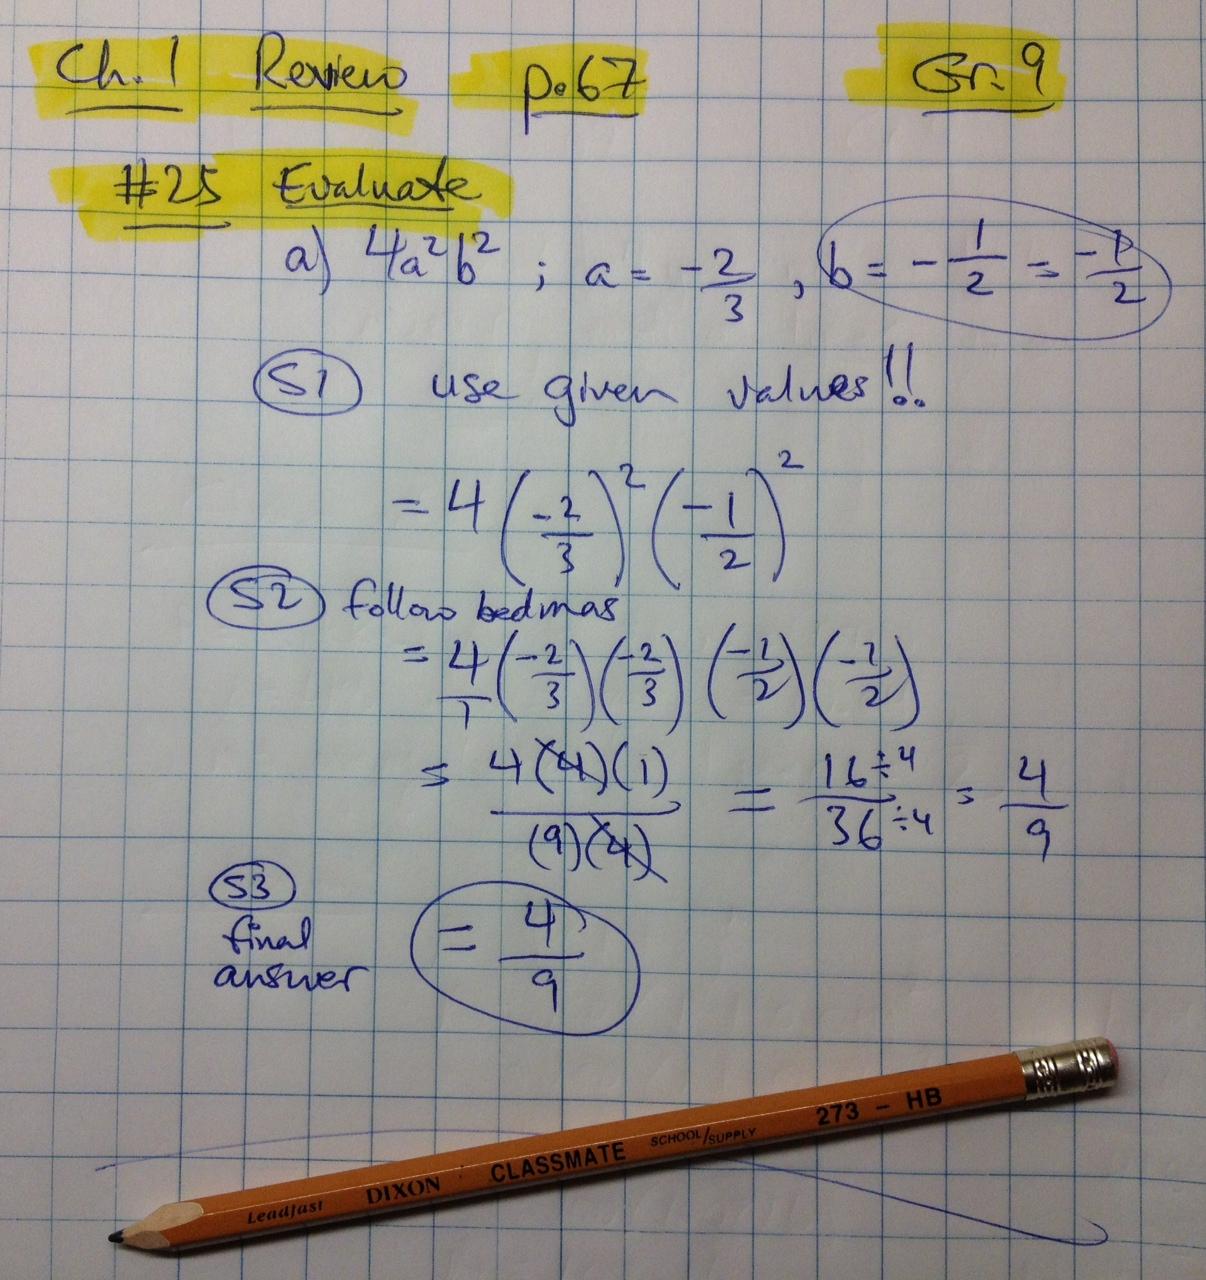 Workbooks nelson math grade 5 workbook : needmathhelp.com ... grade 9 mathematics ... The path is full of ...